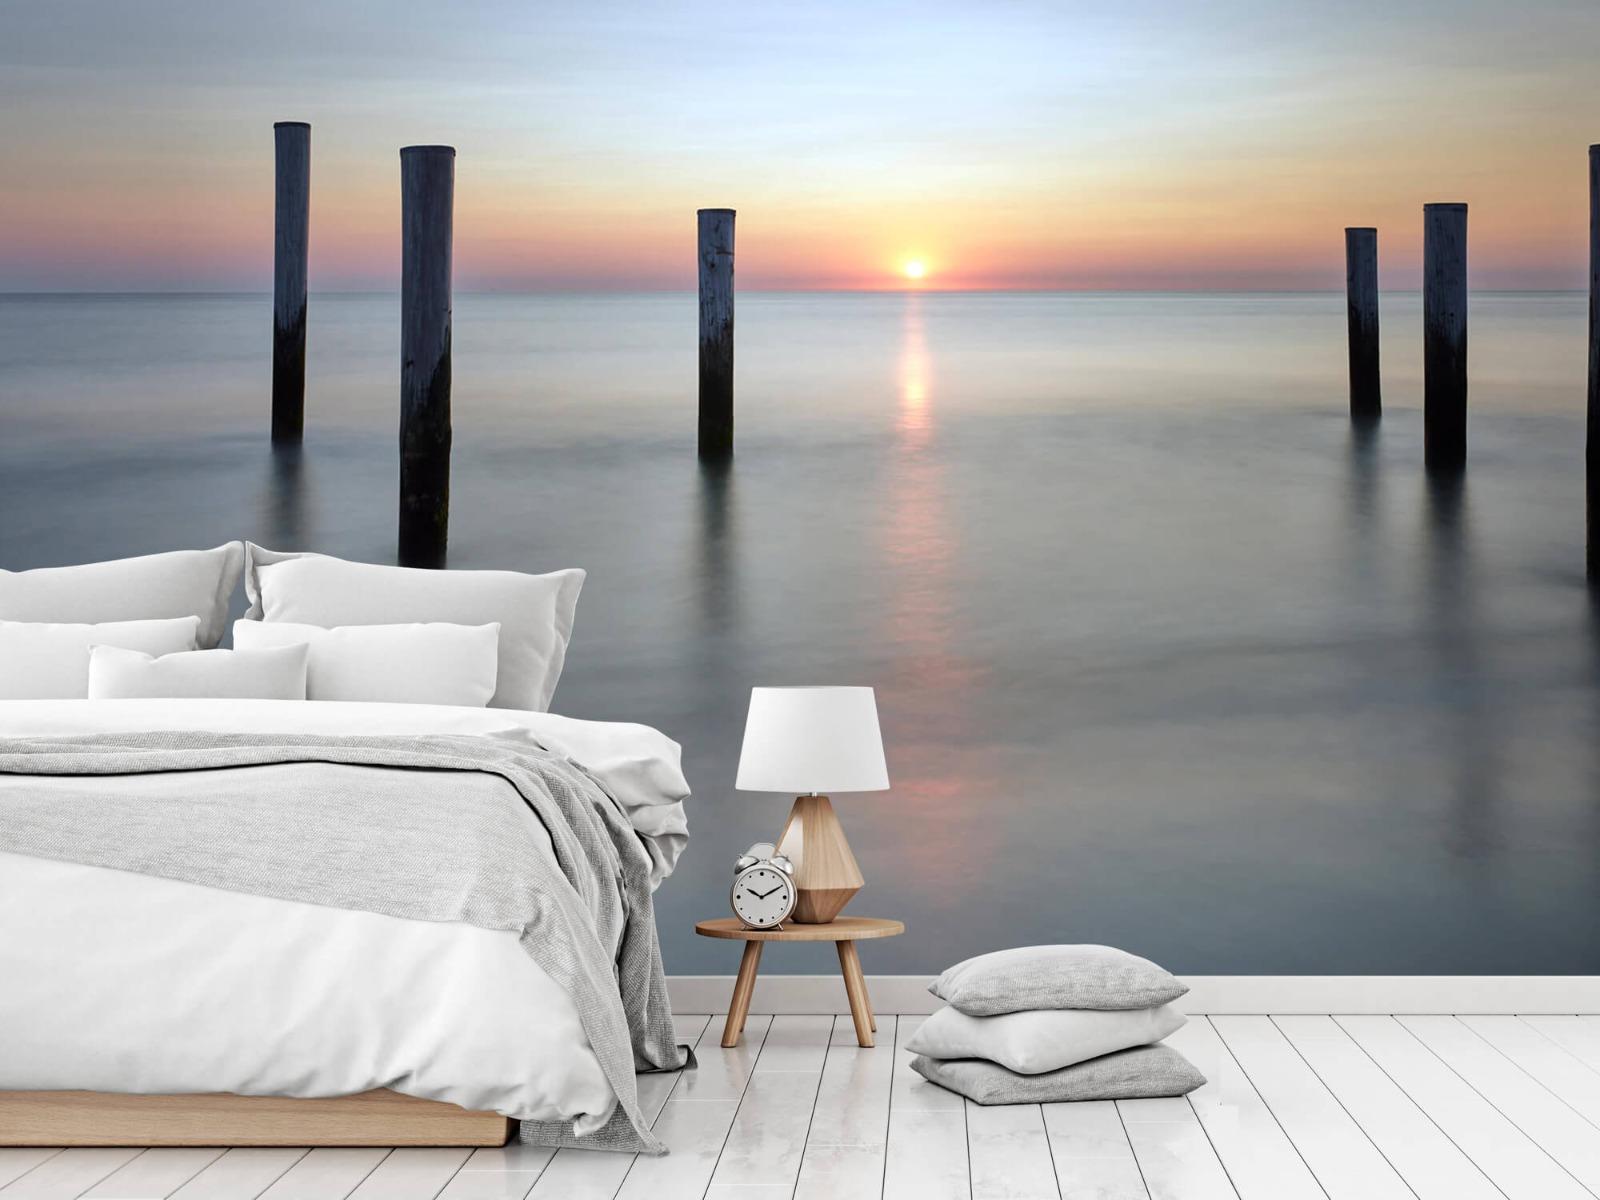 Zeeën en Oceanen - Strandpalen - Slaapkamer 18